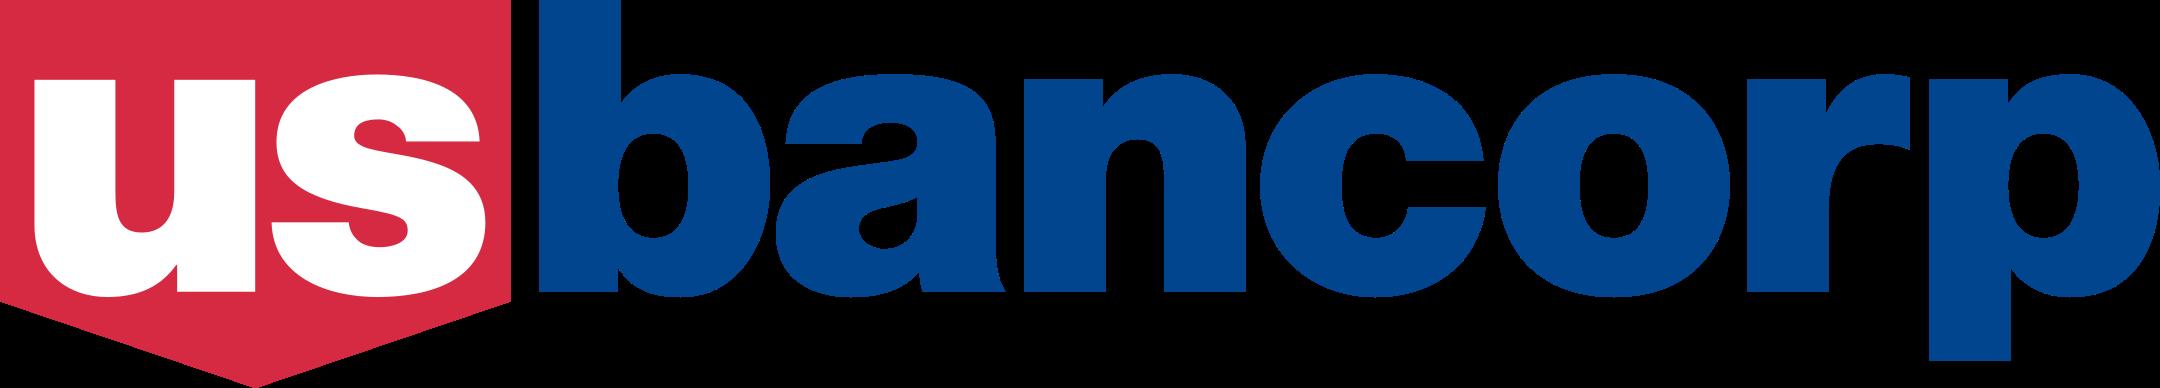 us bancorp logo 1 - U.S. Bancorp Logo